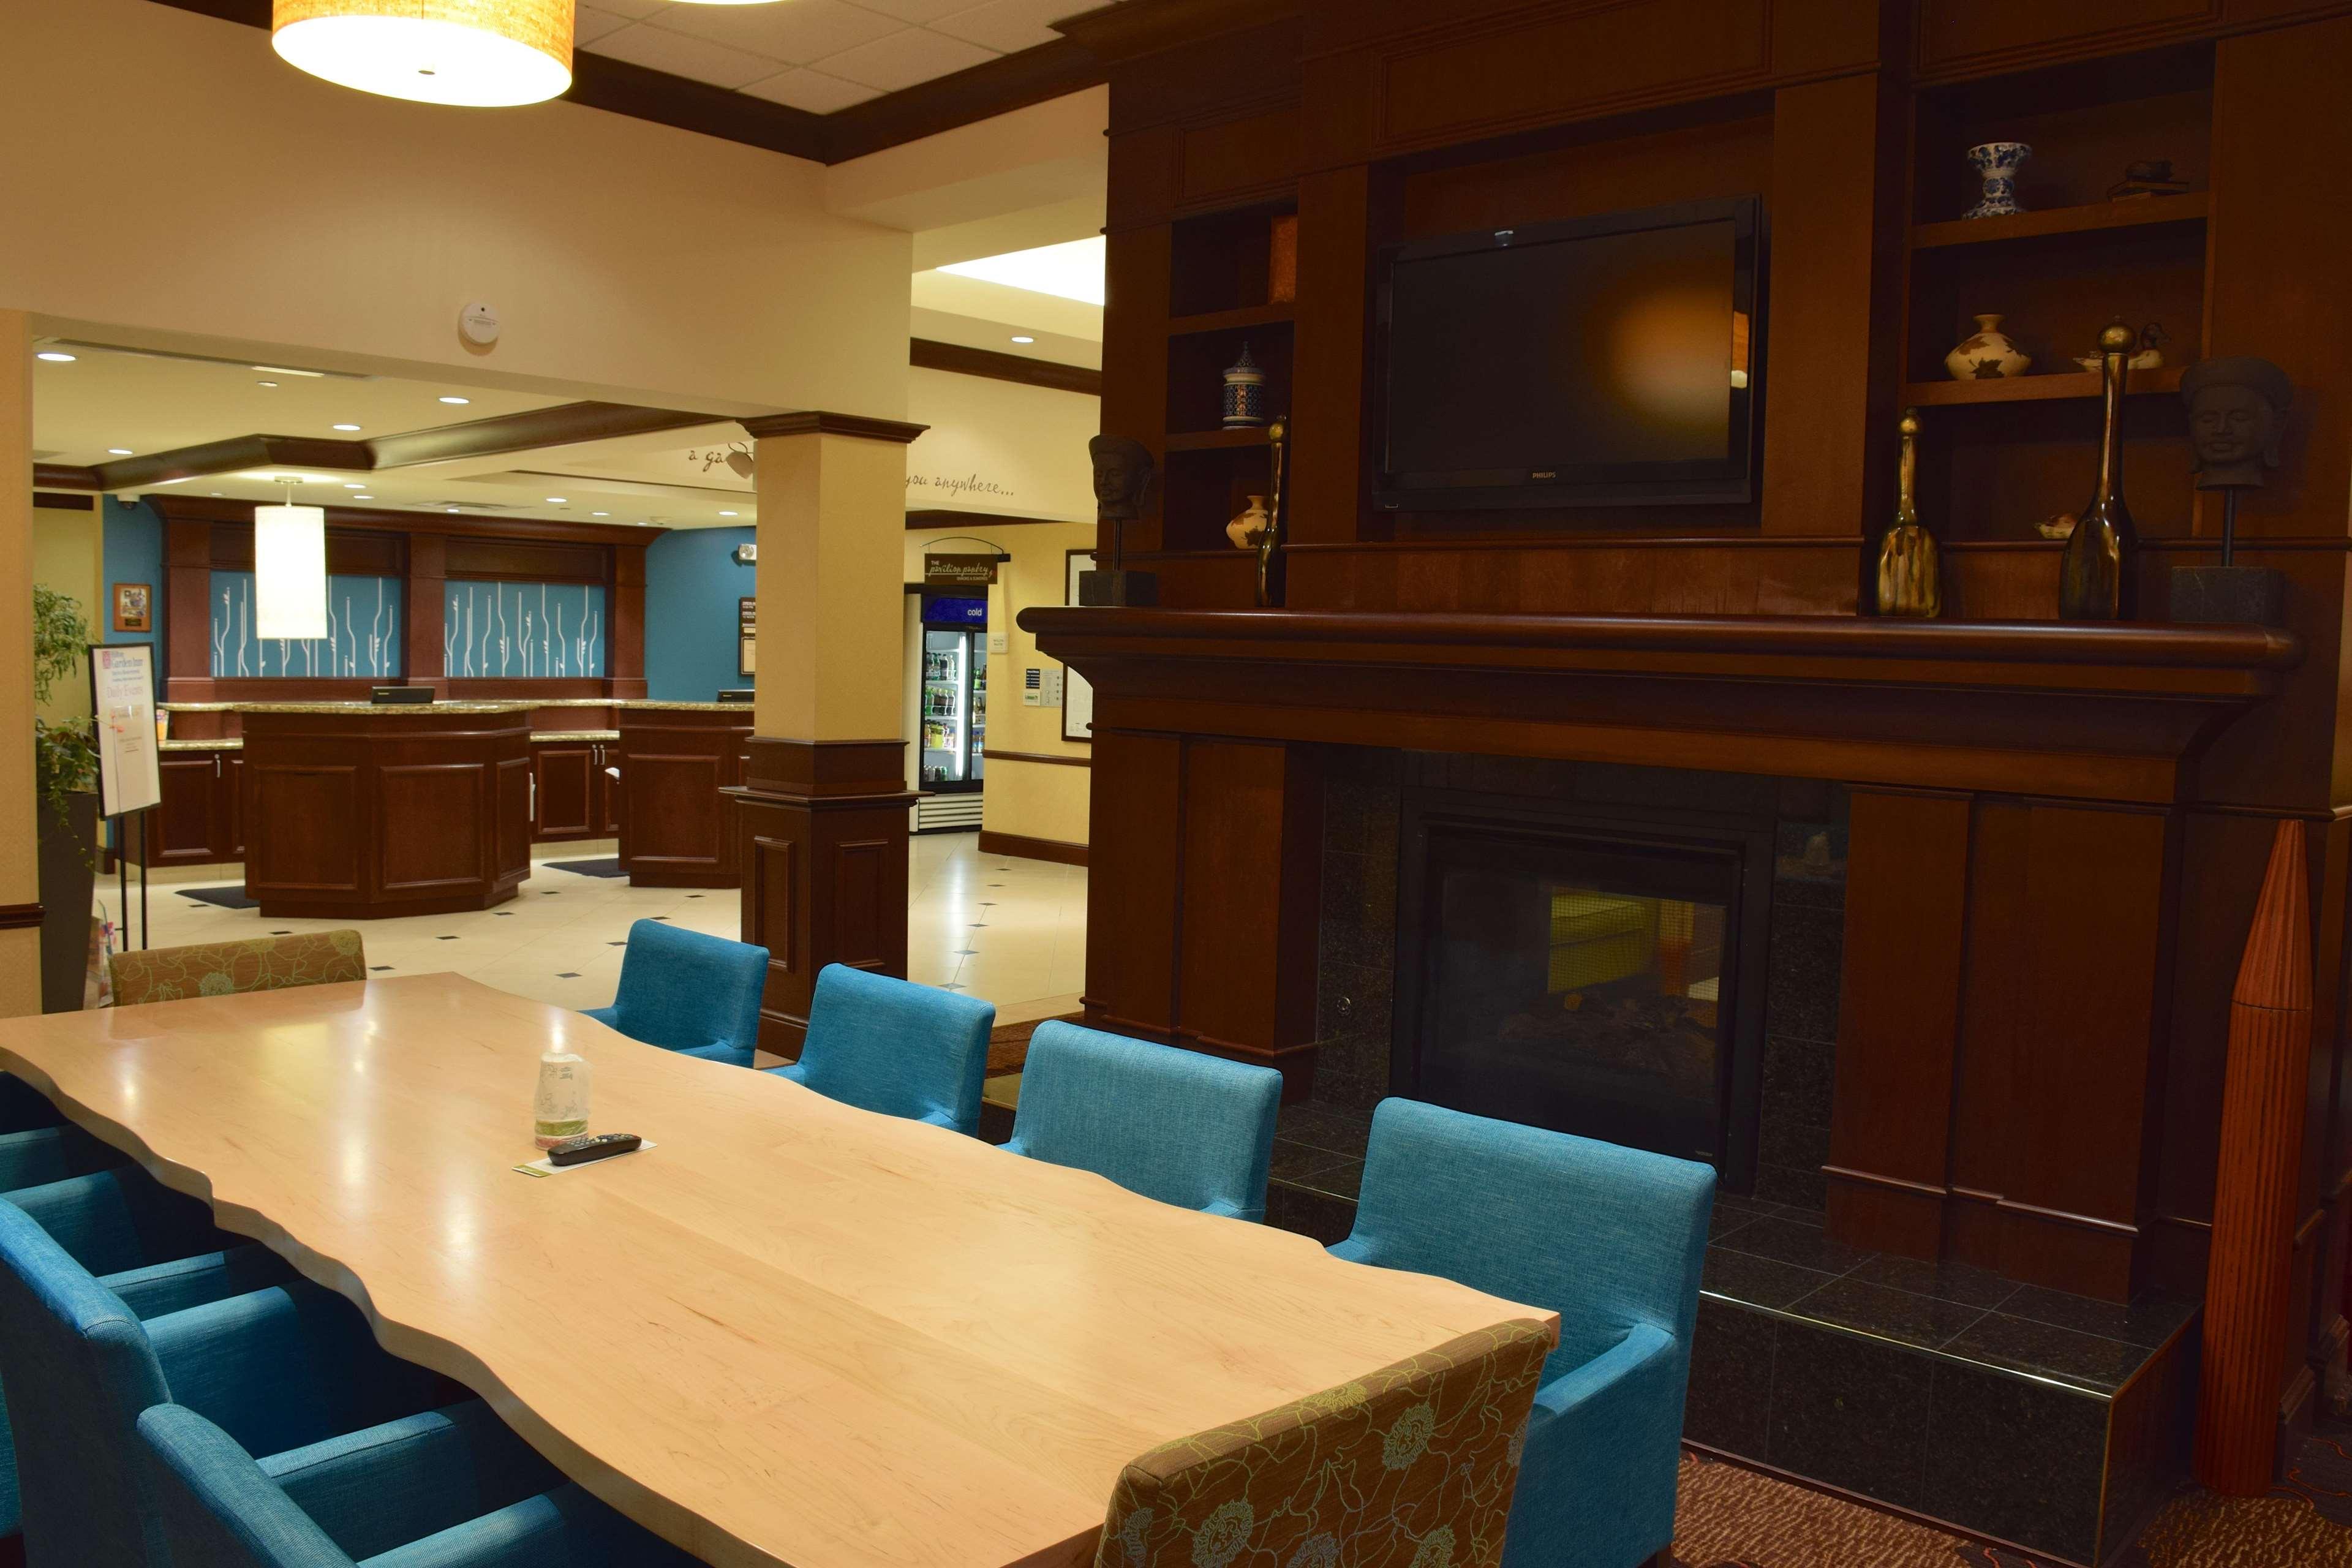 Hilton Garden Inn Dayton Beavercreek image 4